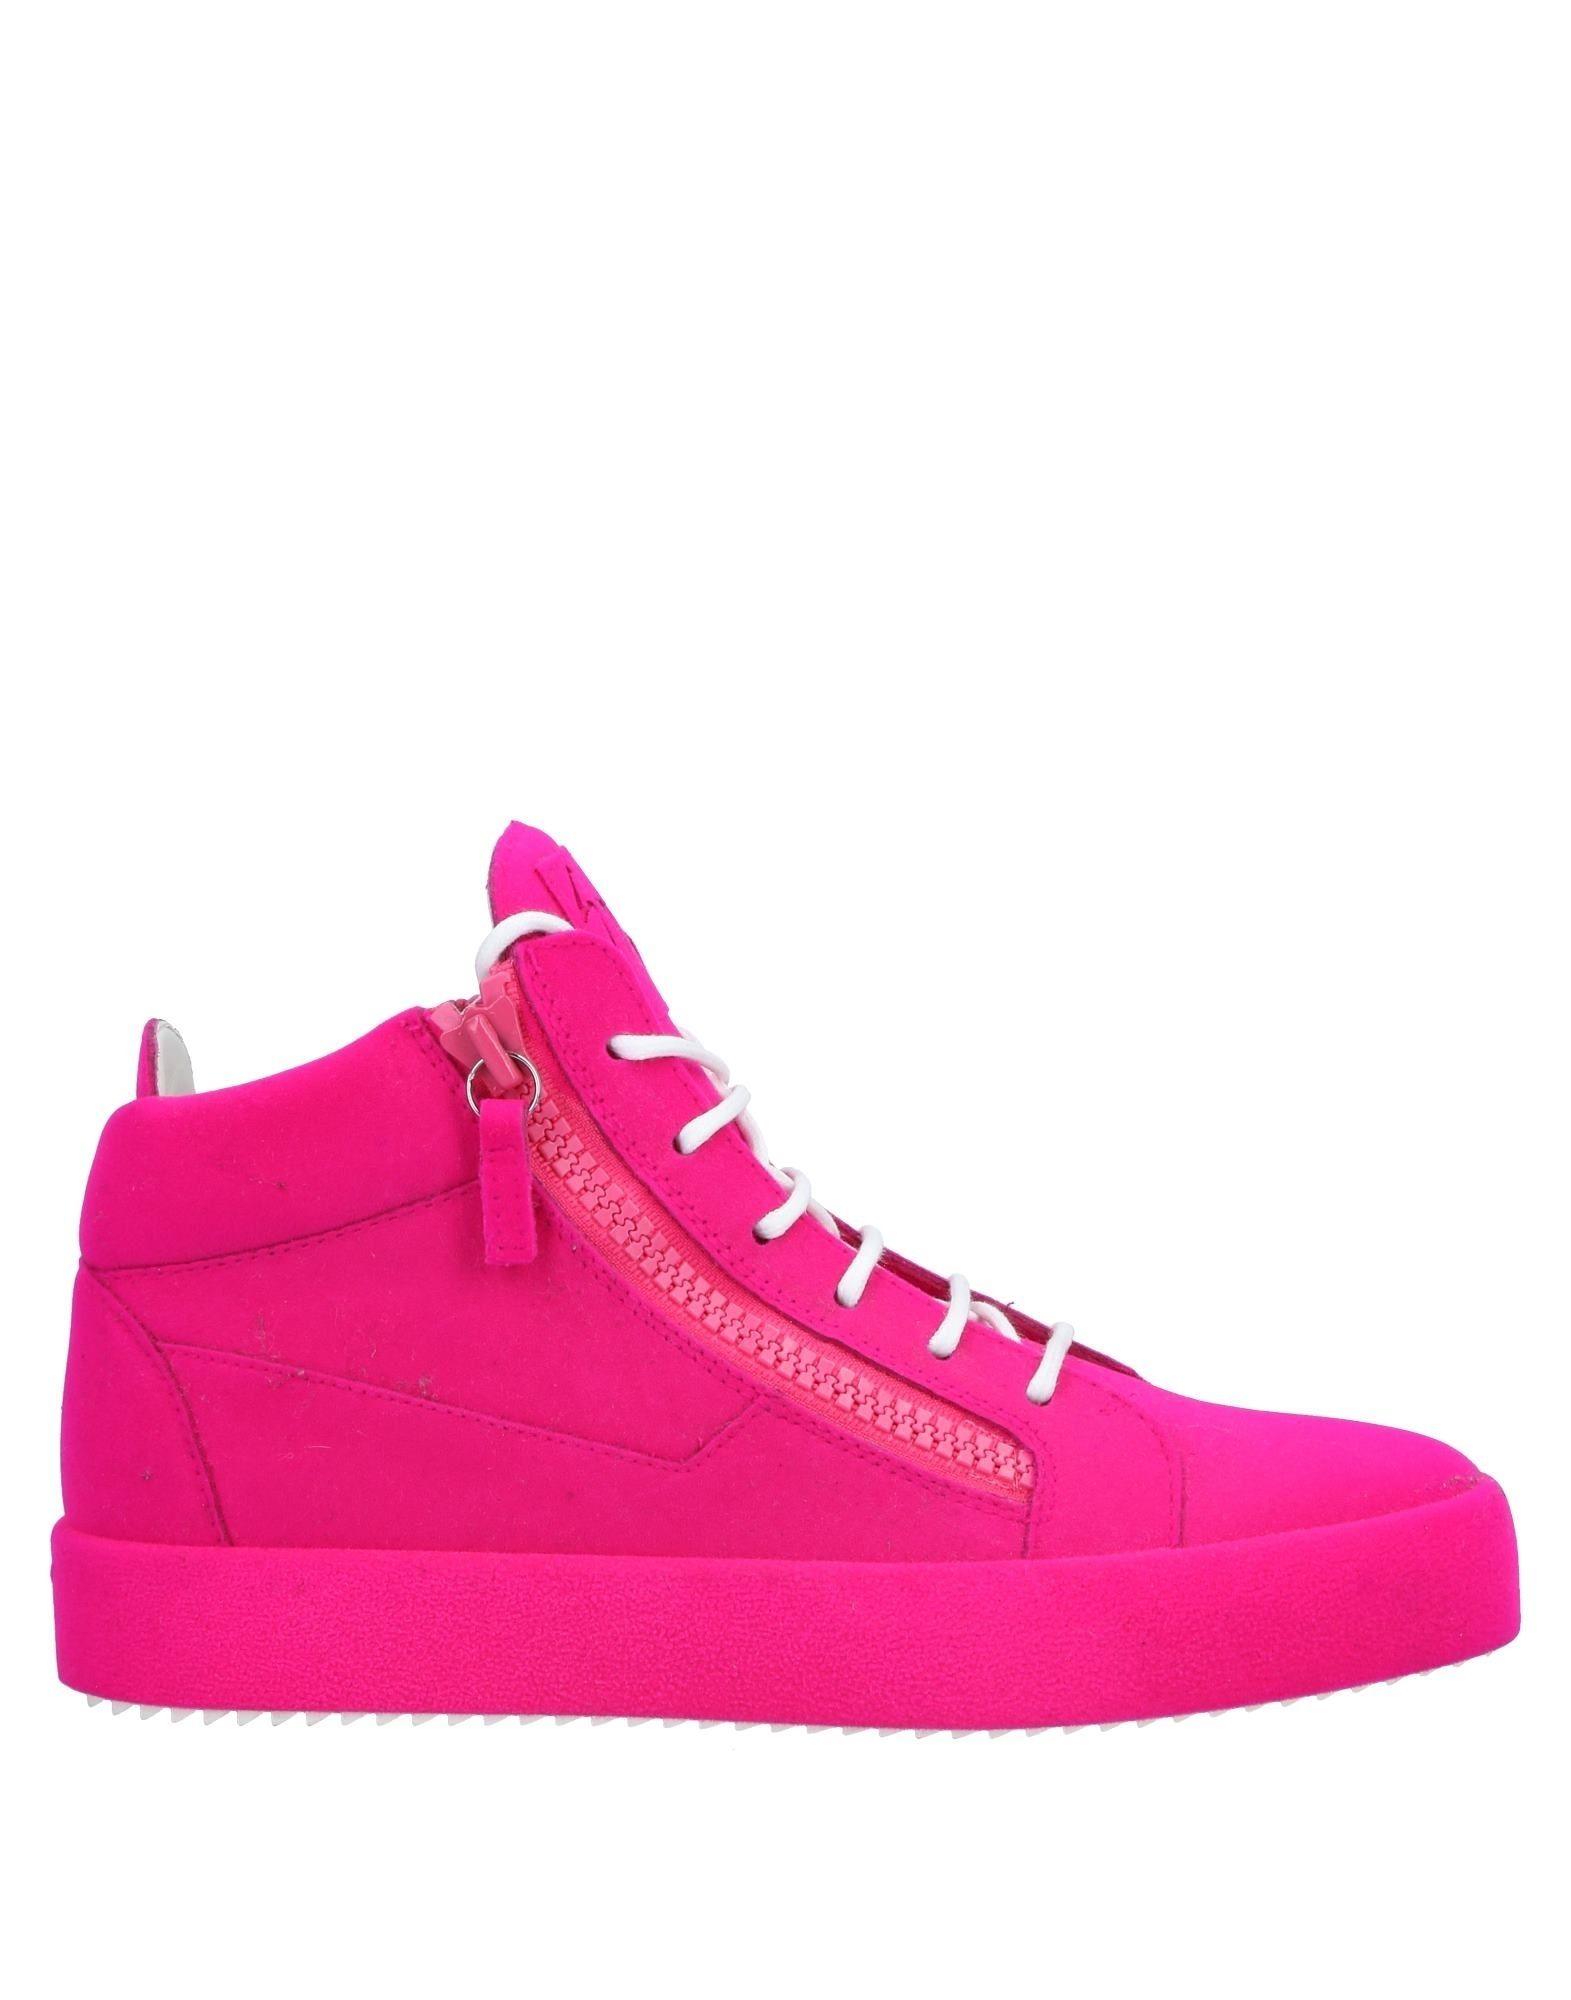 Giuseppe on Zanotti Sneakers - Women Giuseppe Zanotti Sneakers online on Giuseppe  Australia - 11565024JE 67988b